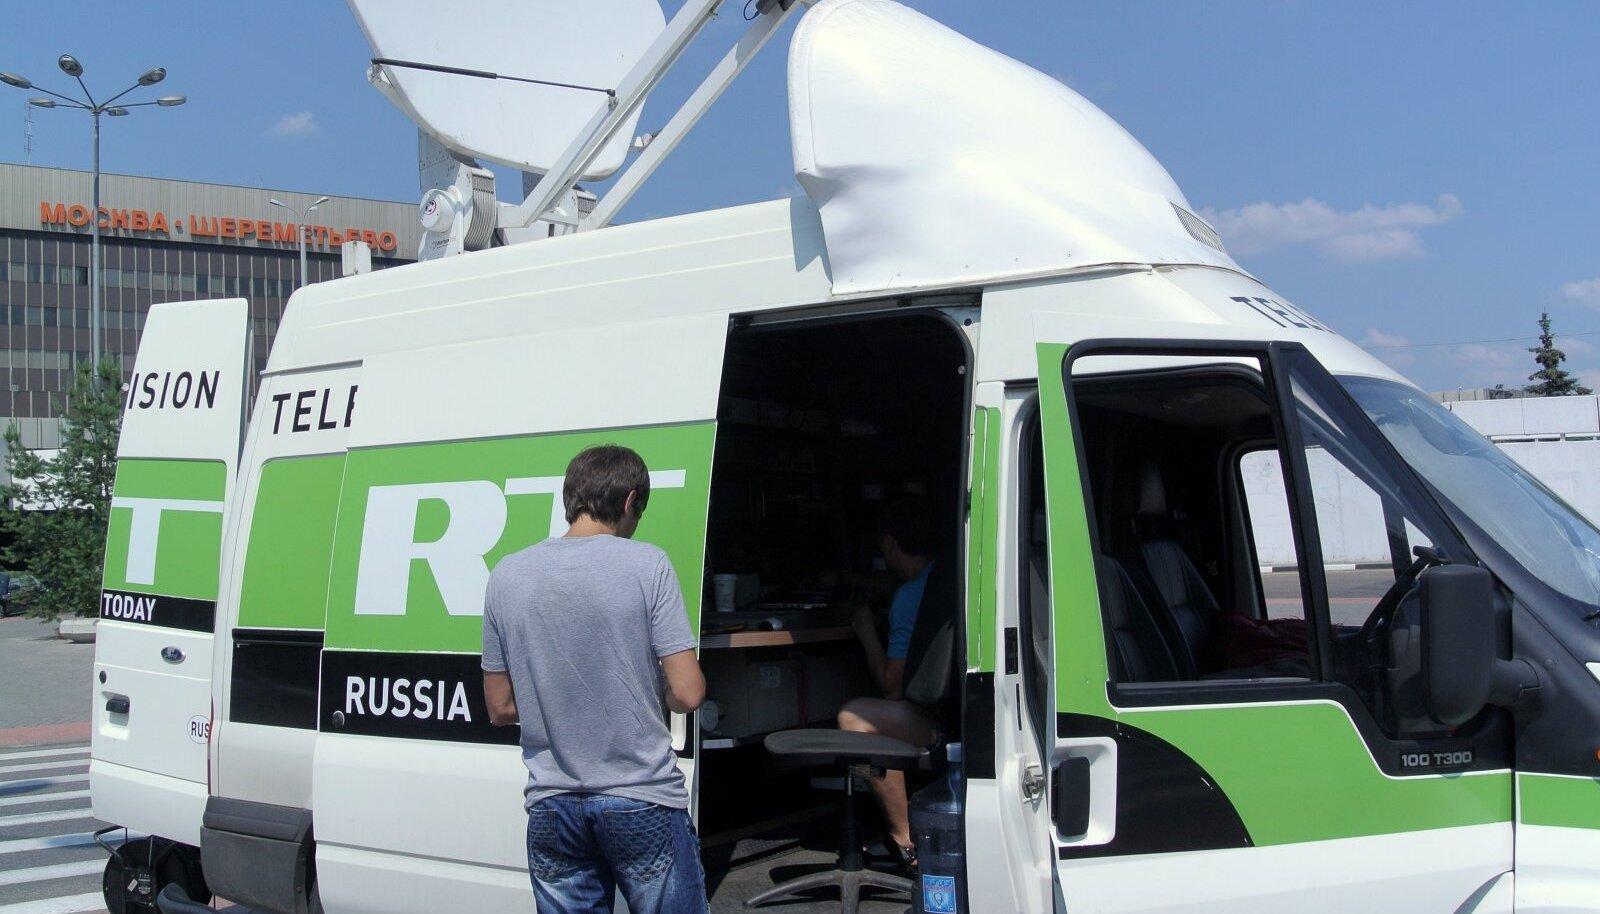 Russia Today töötamas